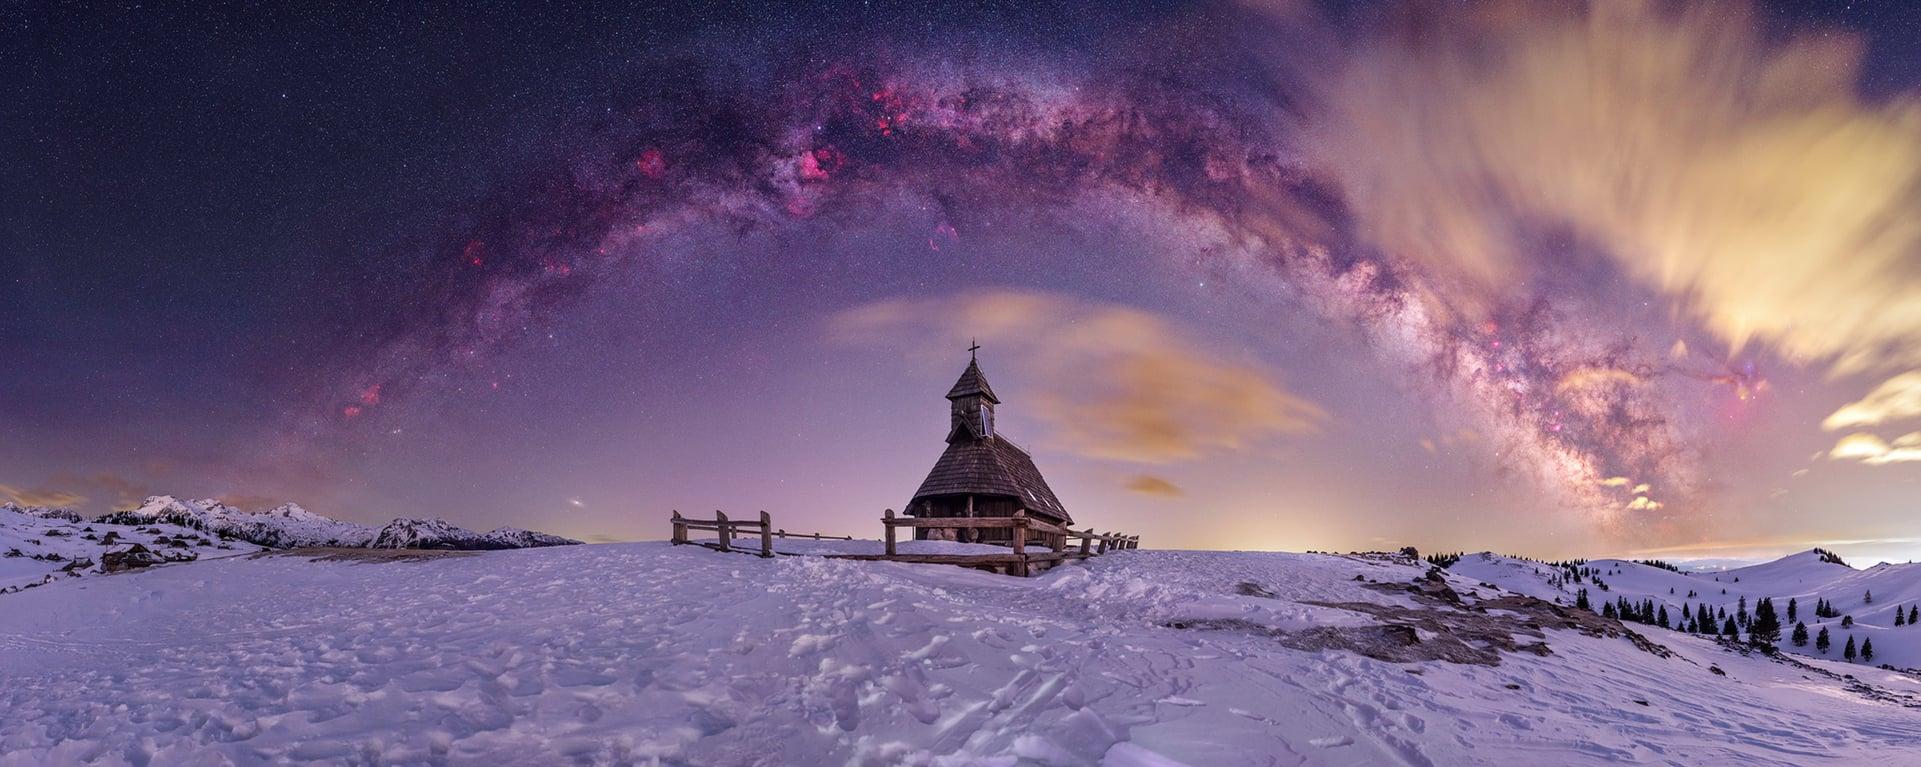 Best Milky Way photographers